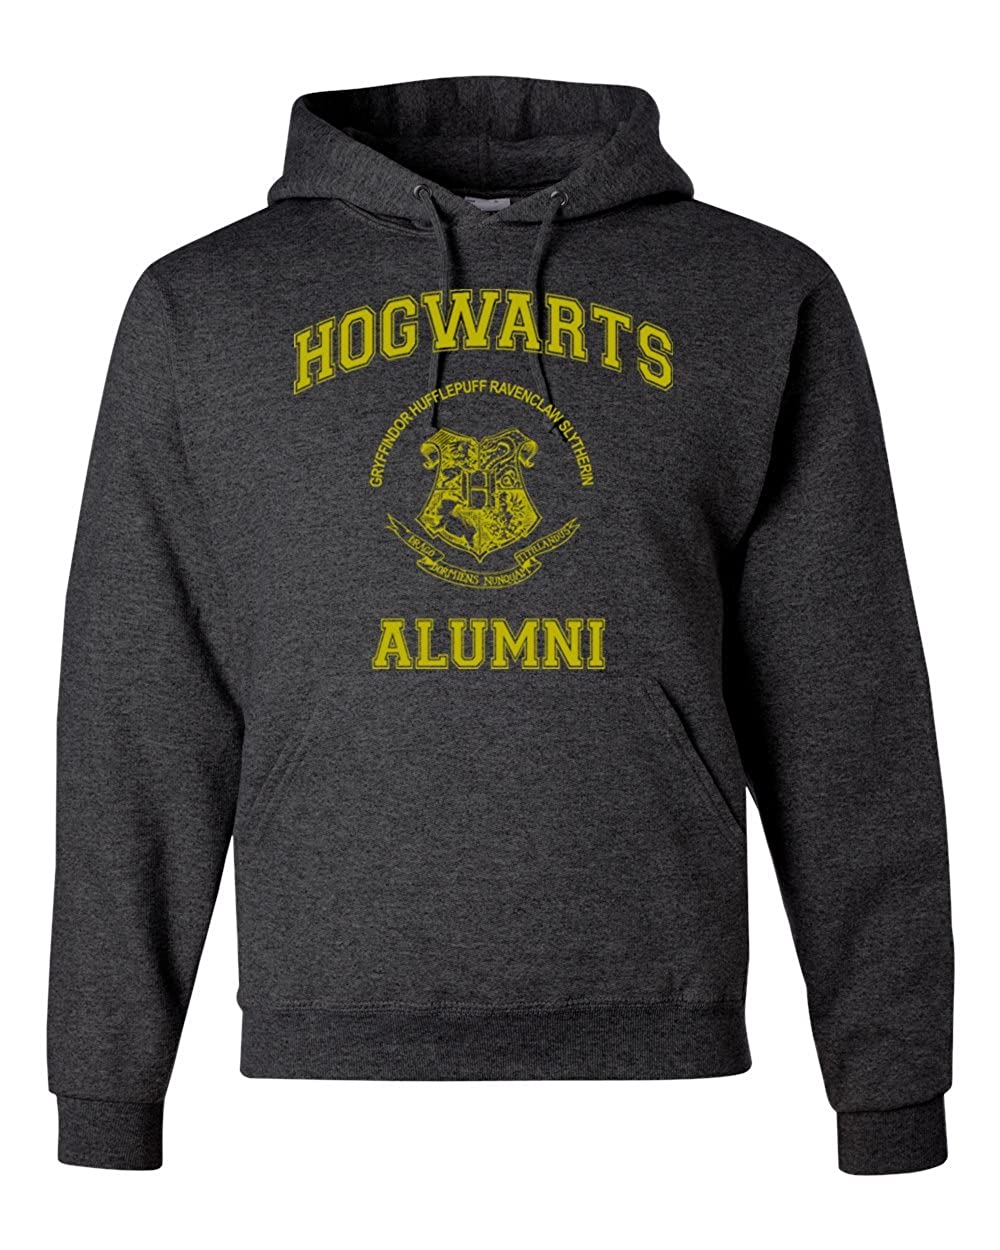 Hogwarts Alumni Harry Potter Unisex Hooded Sweatshirt Fashion Hoodie